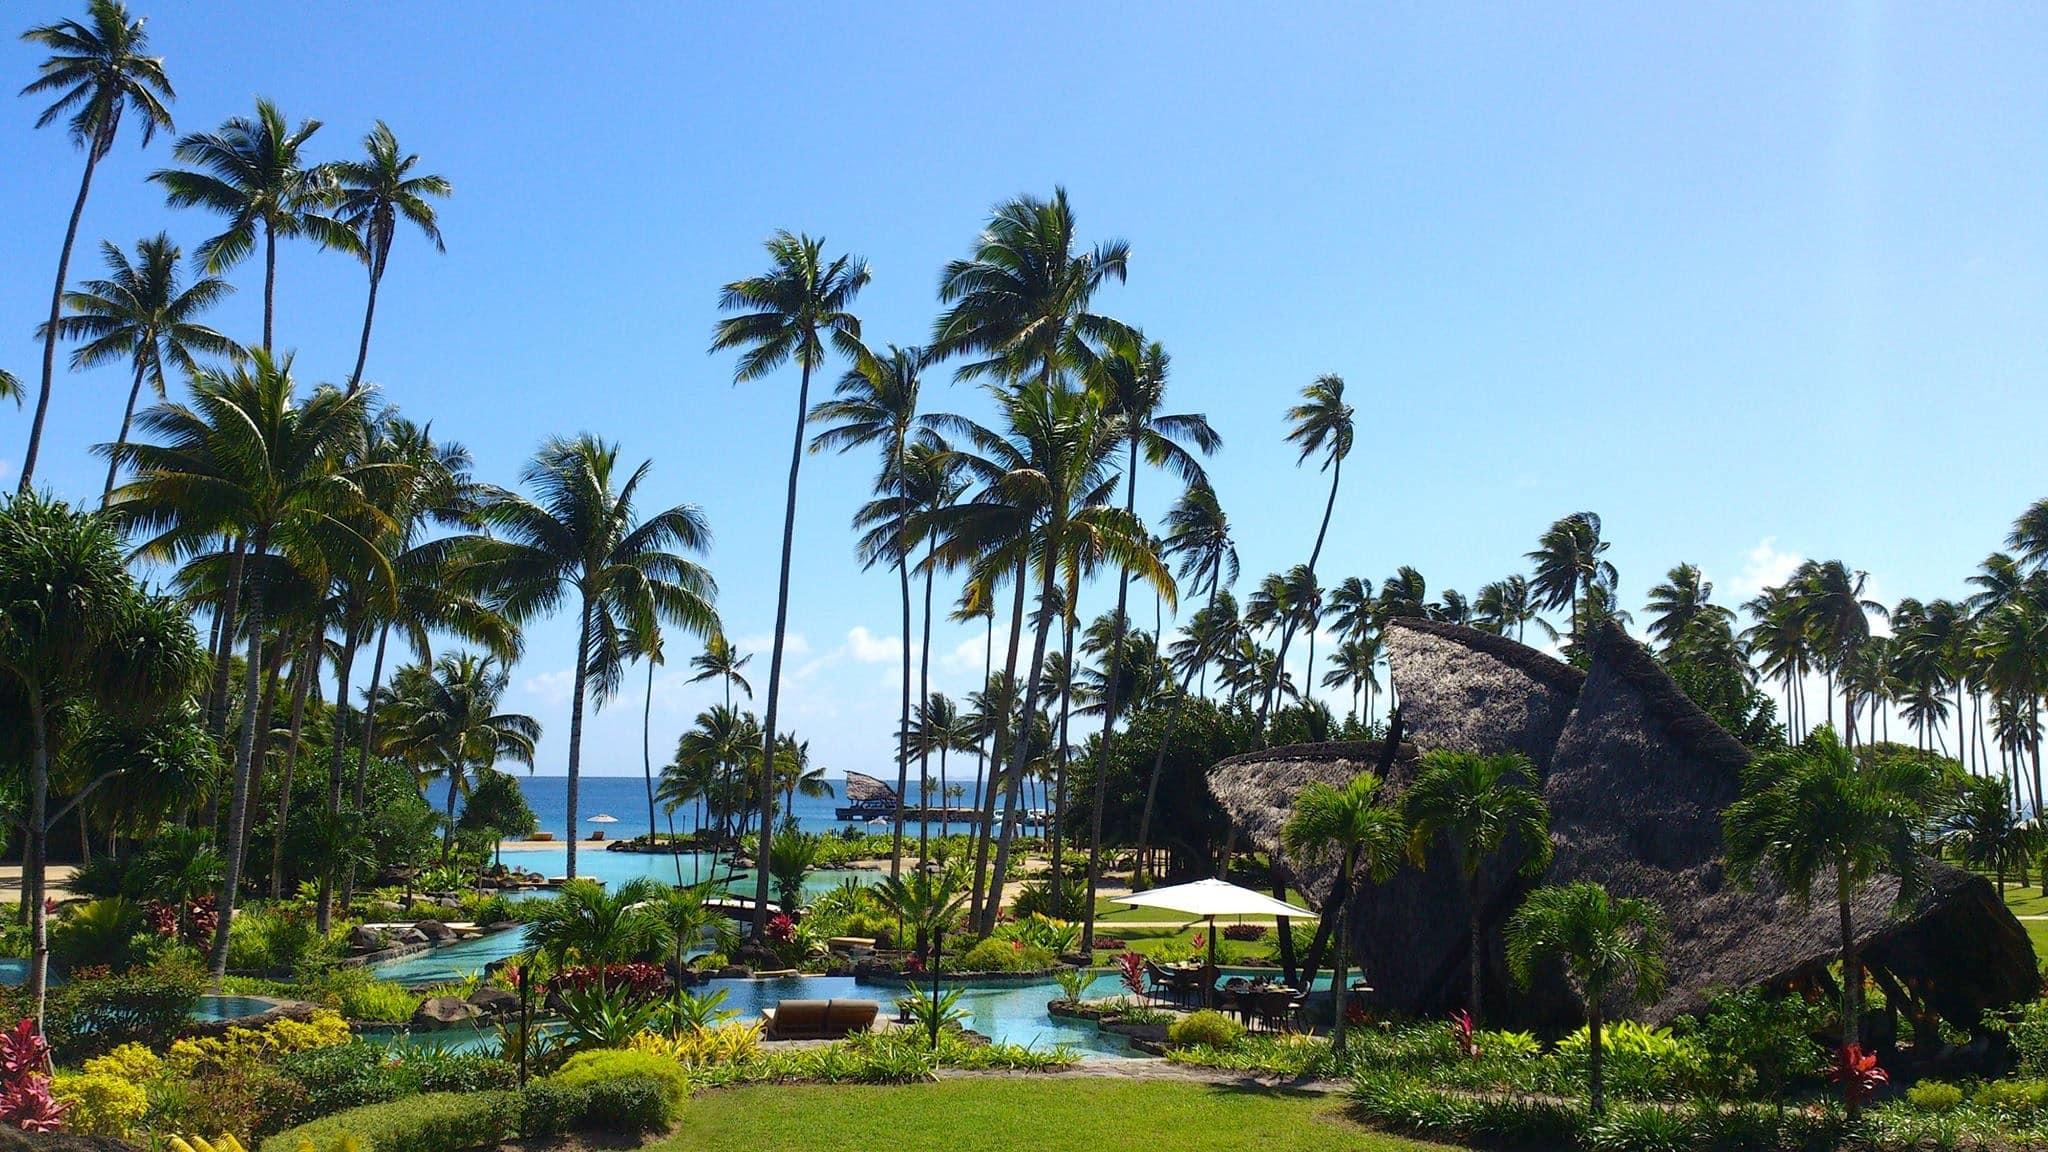 Laucala Island - hotels chers monde